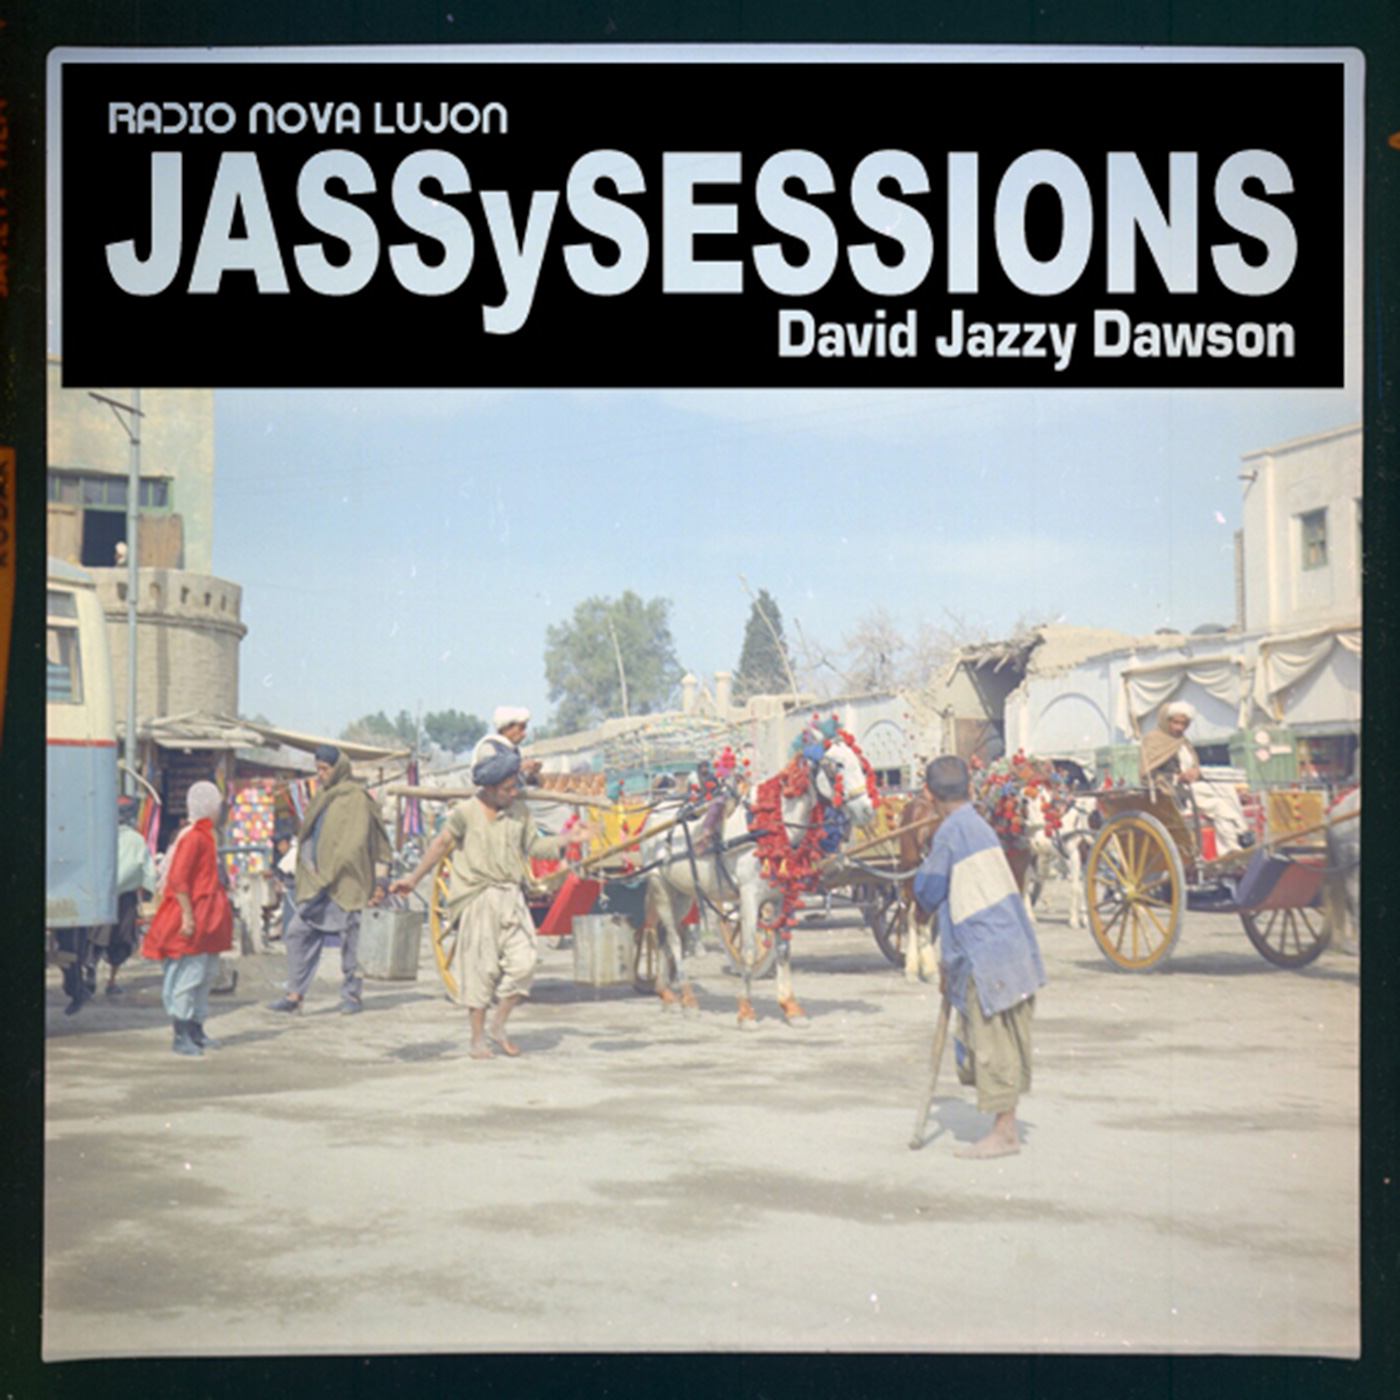 Jazzcasts